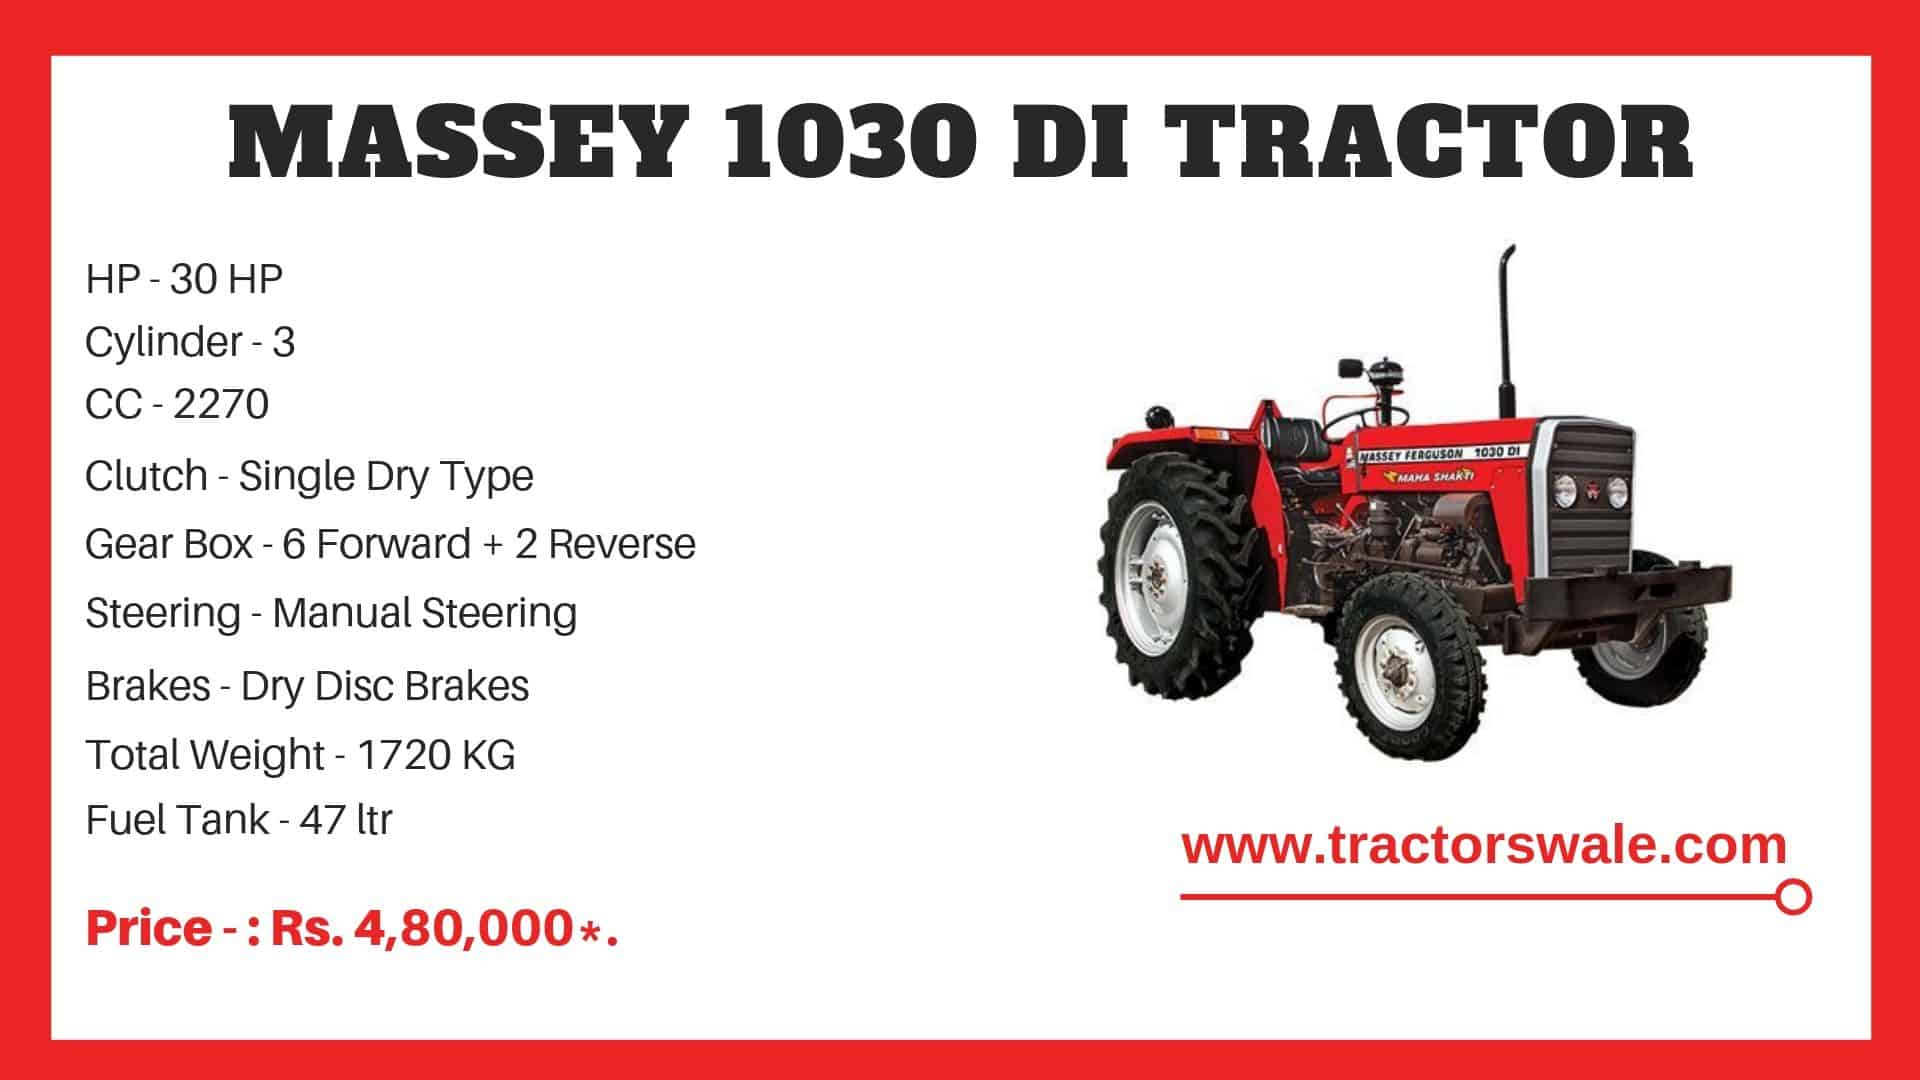 Specifications Of Massey Ferguson 1030 di